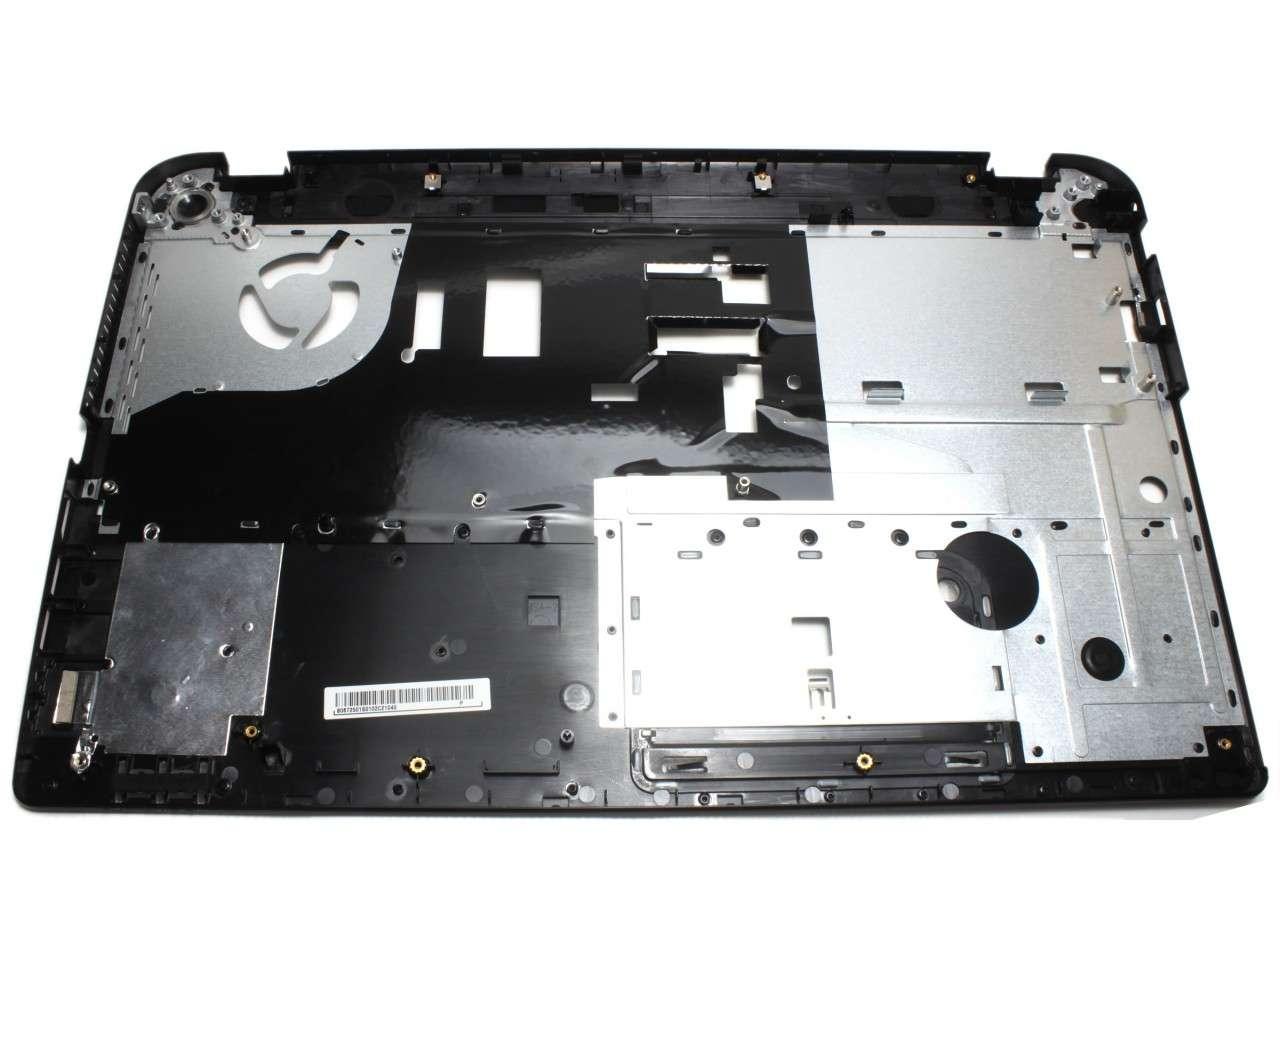 Palmrest Toshiba Satellite L50 A Gri Negru fara touchpad Refurbished imagine powerlaptop.ro 2021